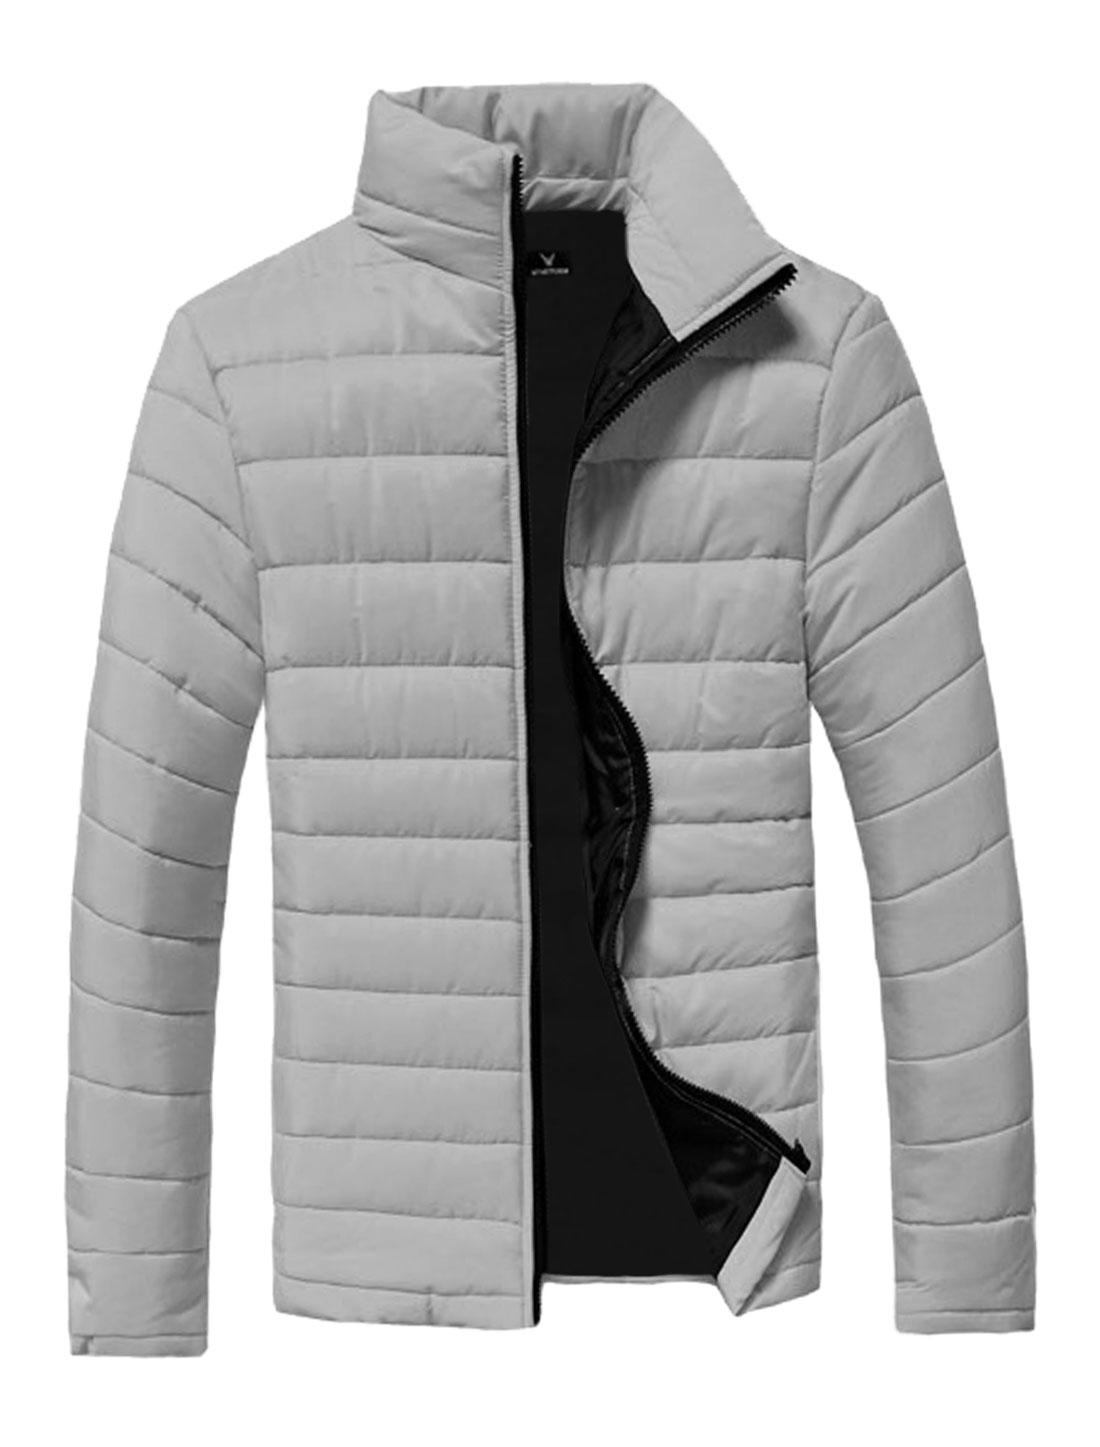 Men Gray Zip Fly Zipper Pockets Slim Cut Leisure Padded Coat S